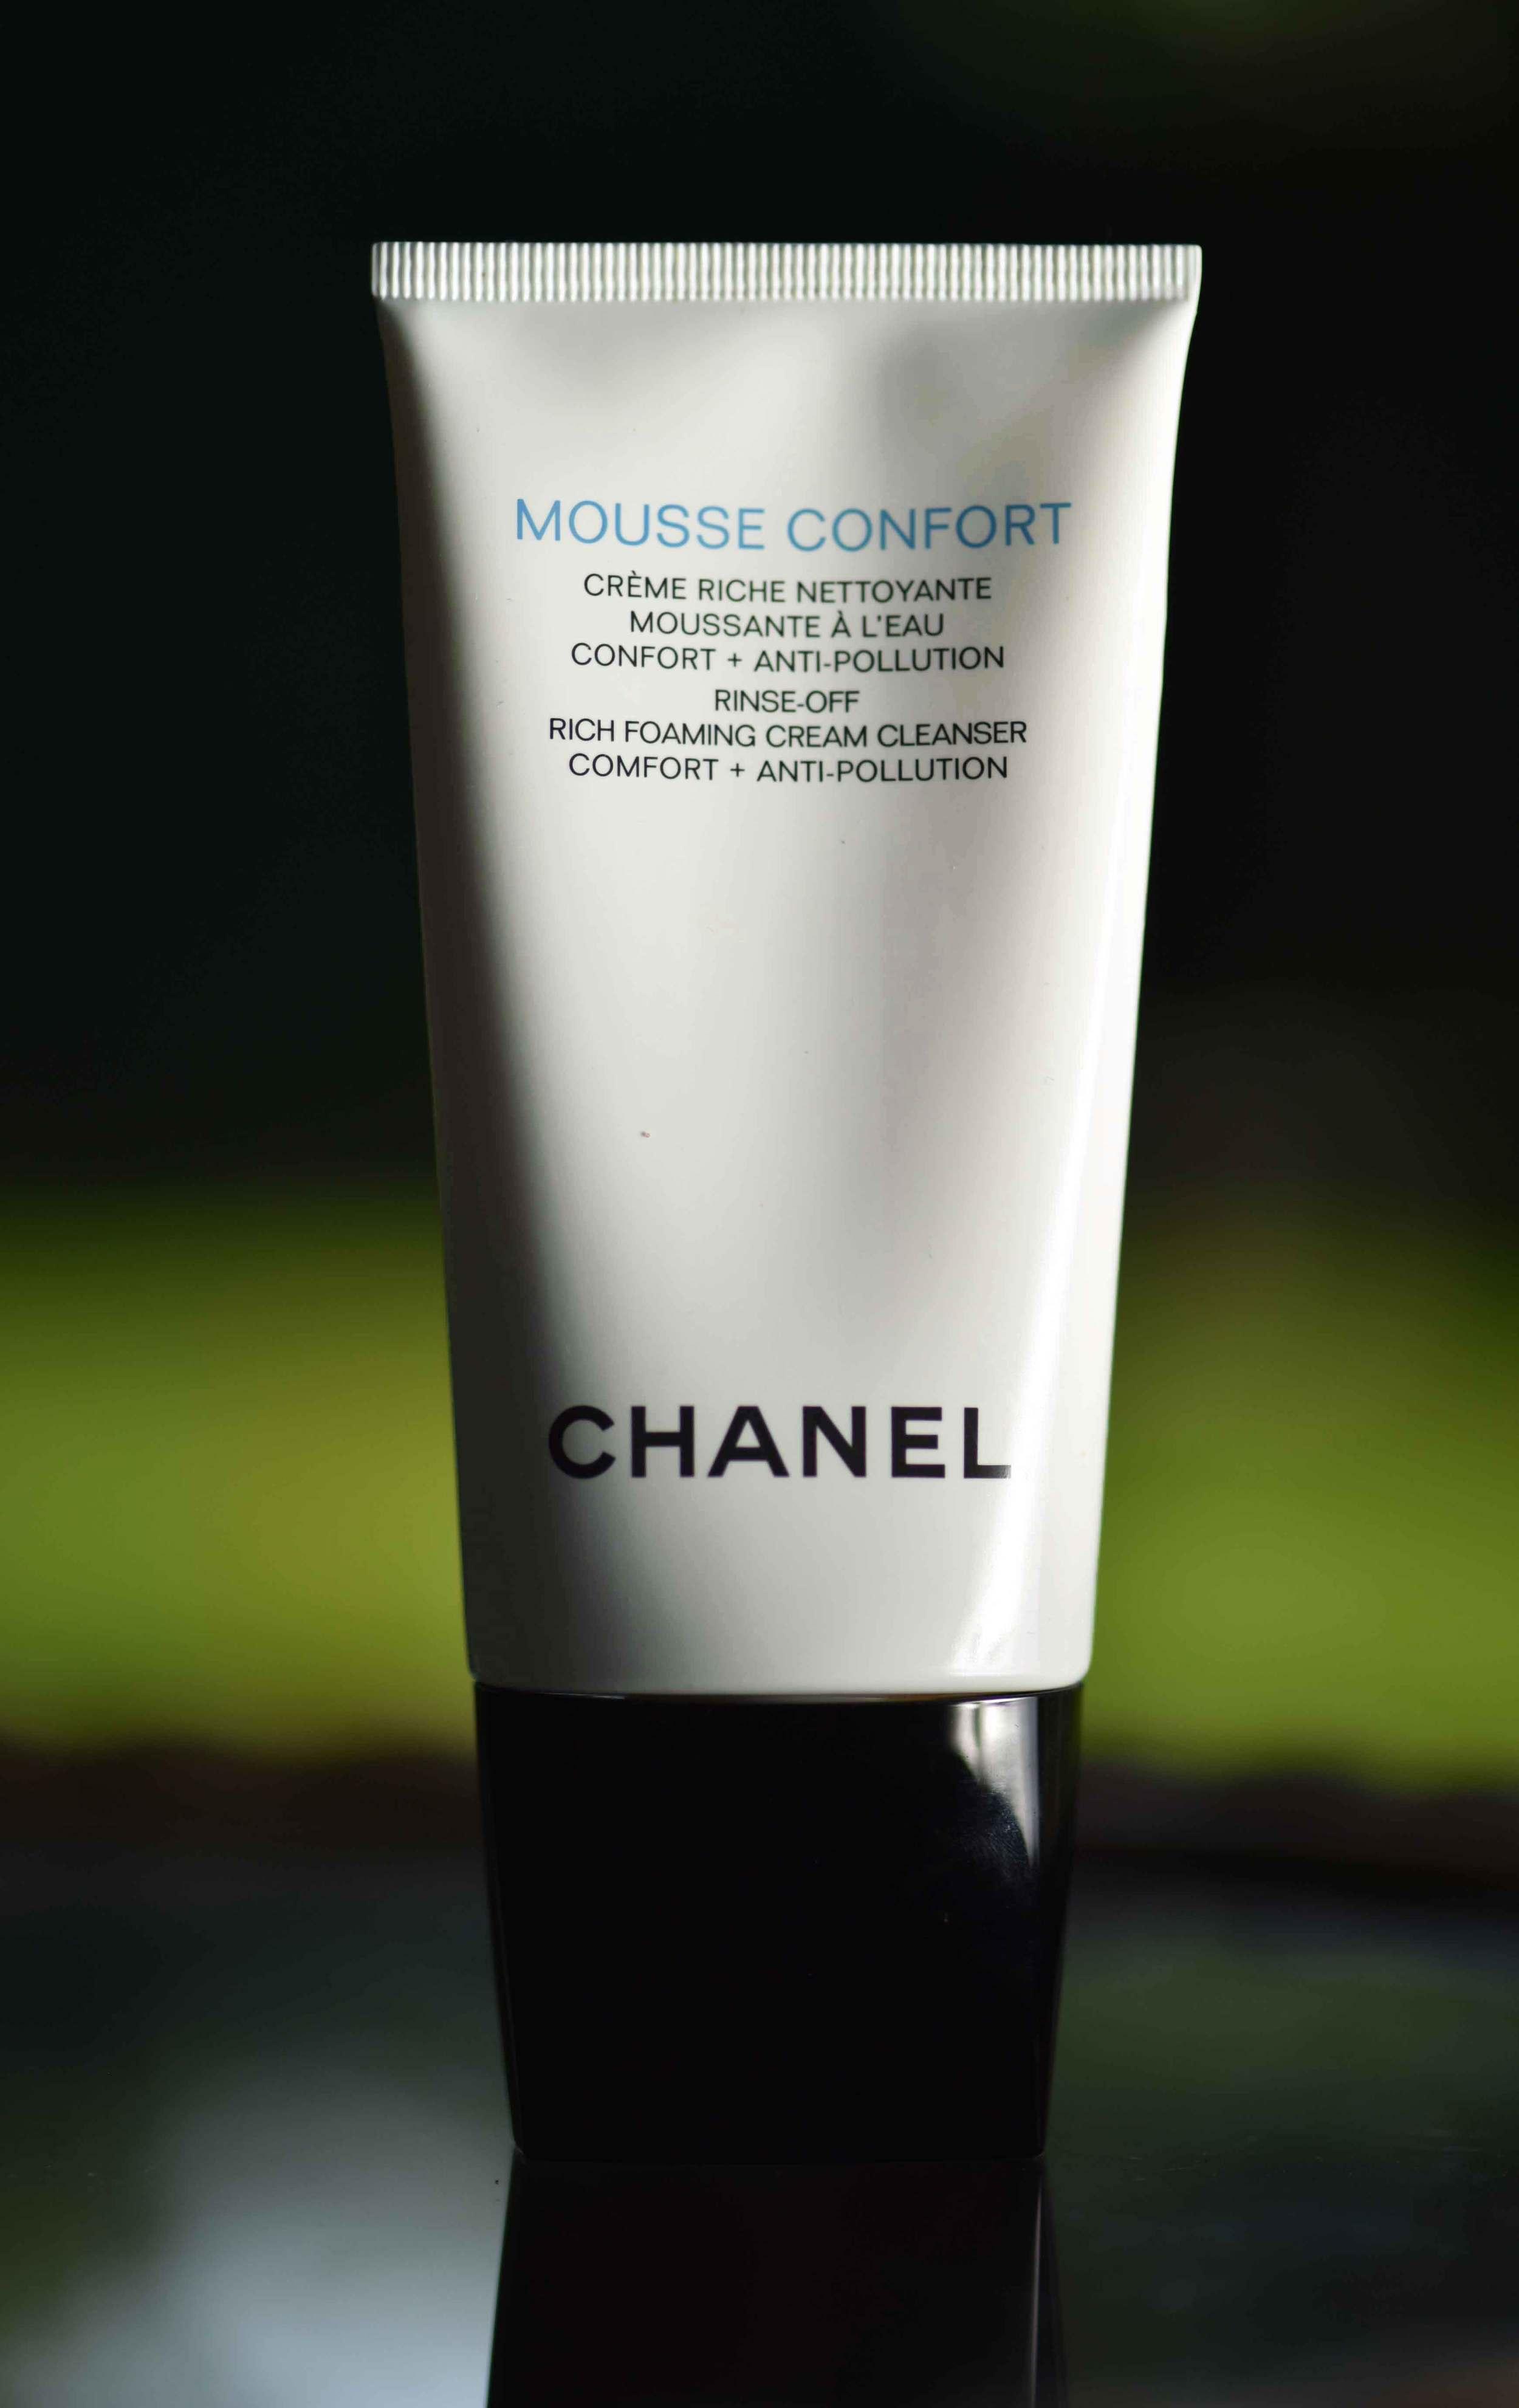 The Chanel foaming cleanser.Image©gunjanvirk